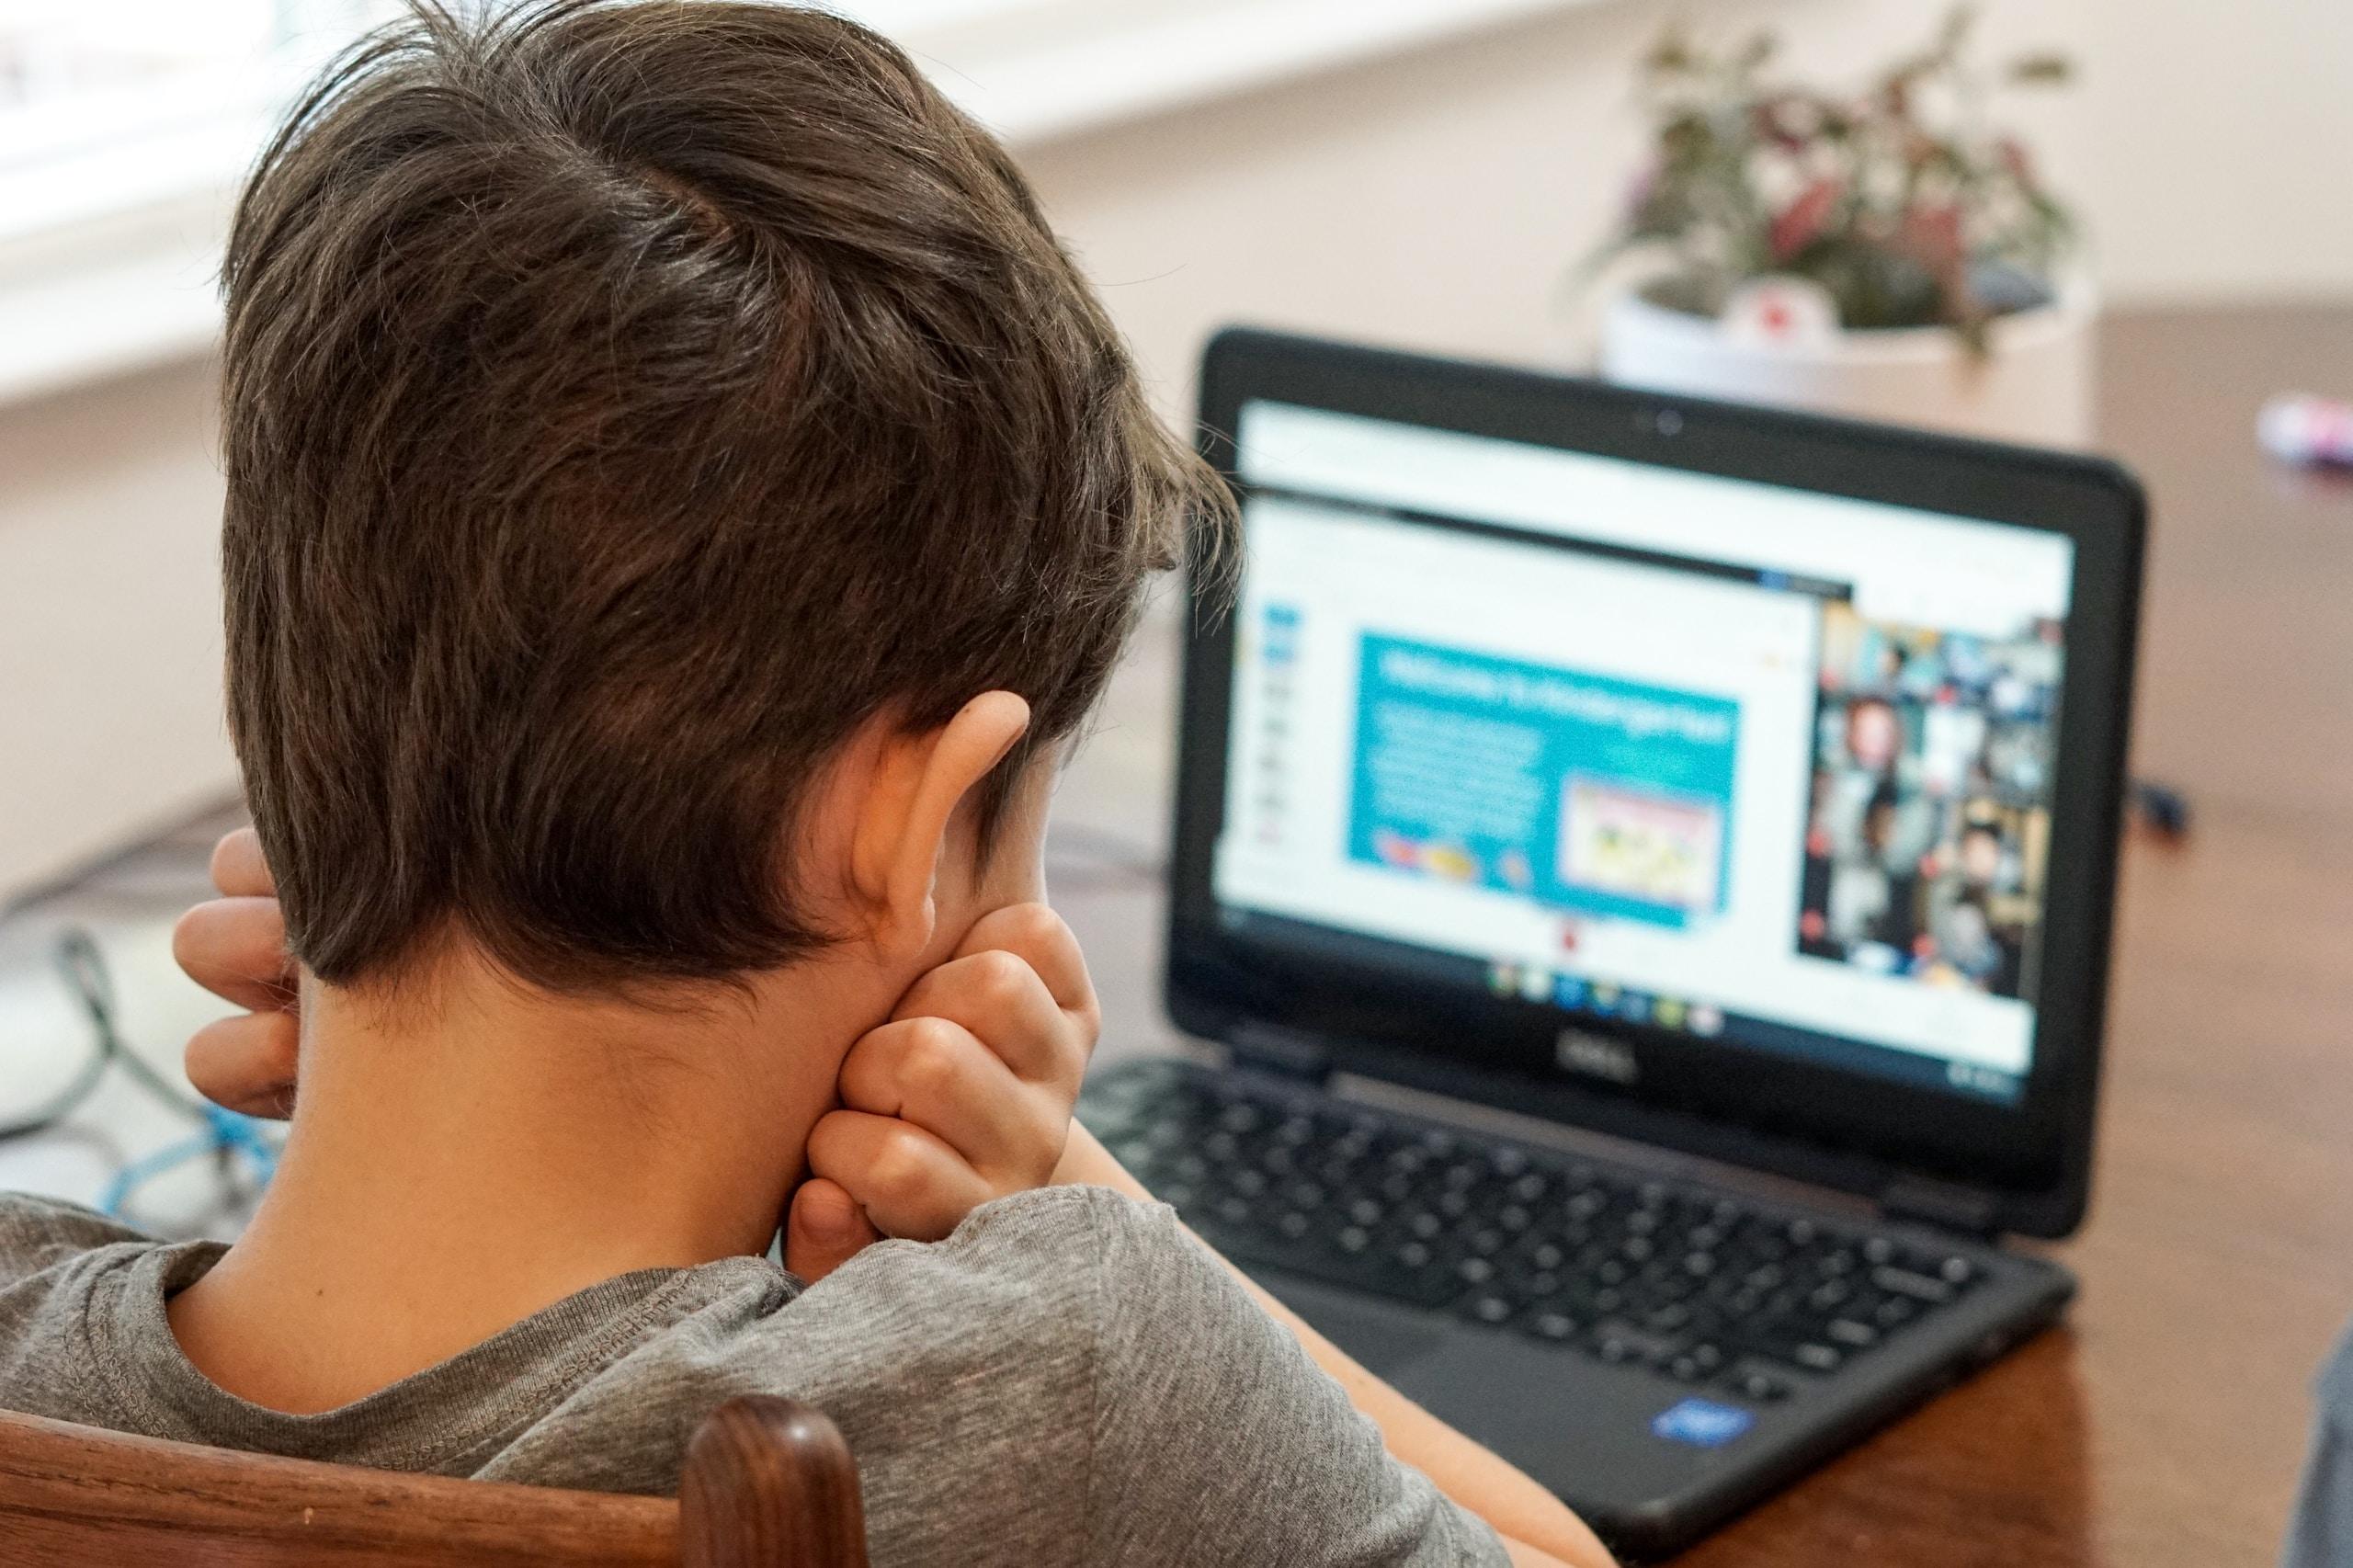 boy in gray shirt using black laptop computer